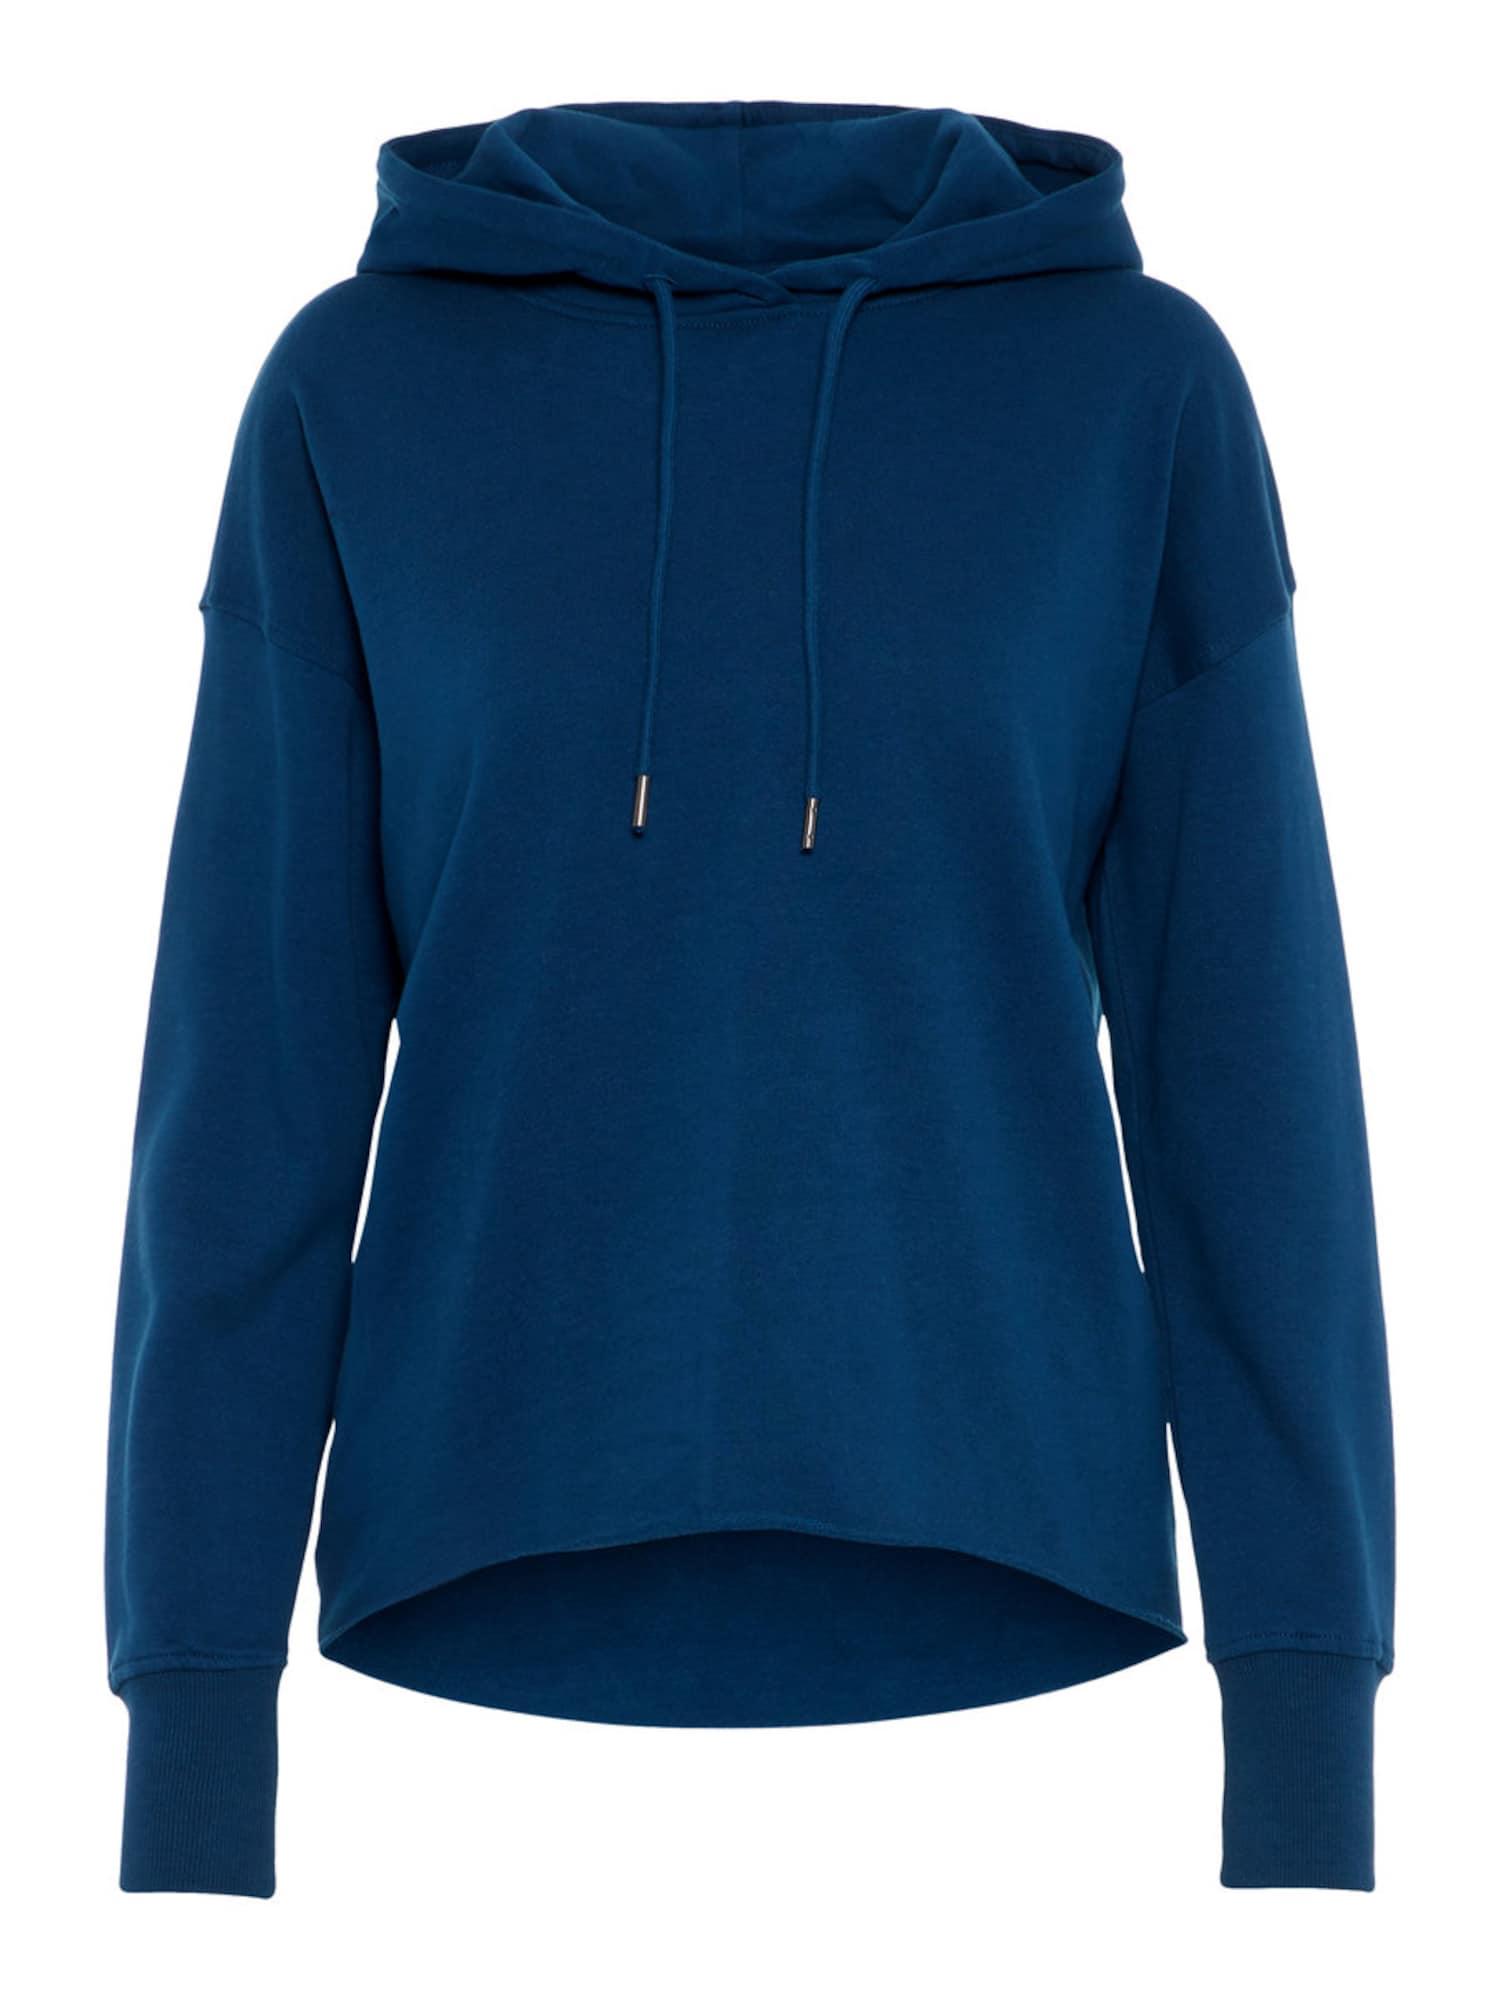 VERO MODA, Dames Sweatshirt, blauw